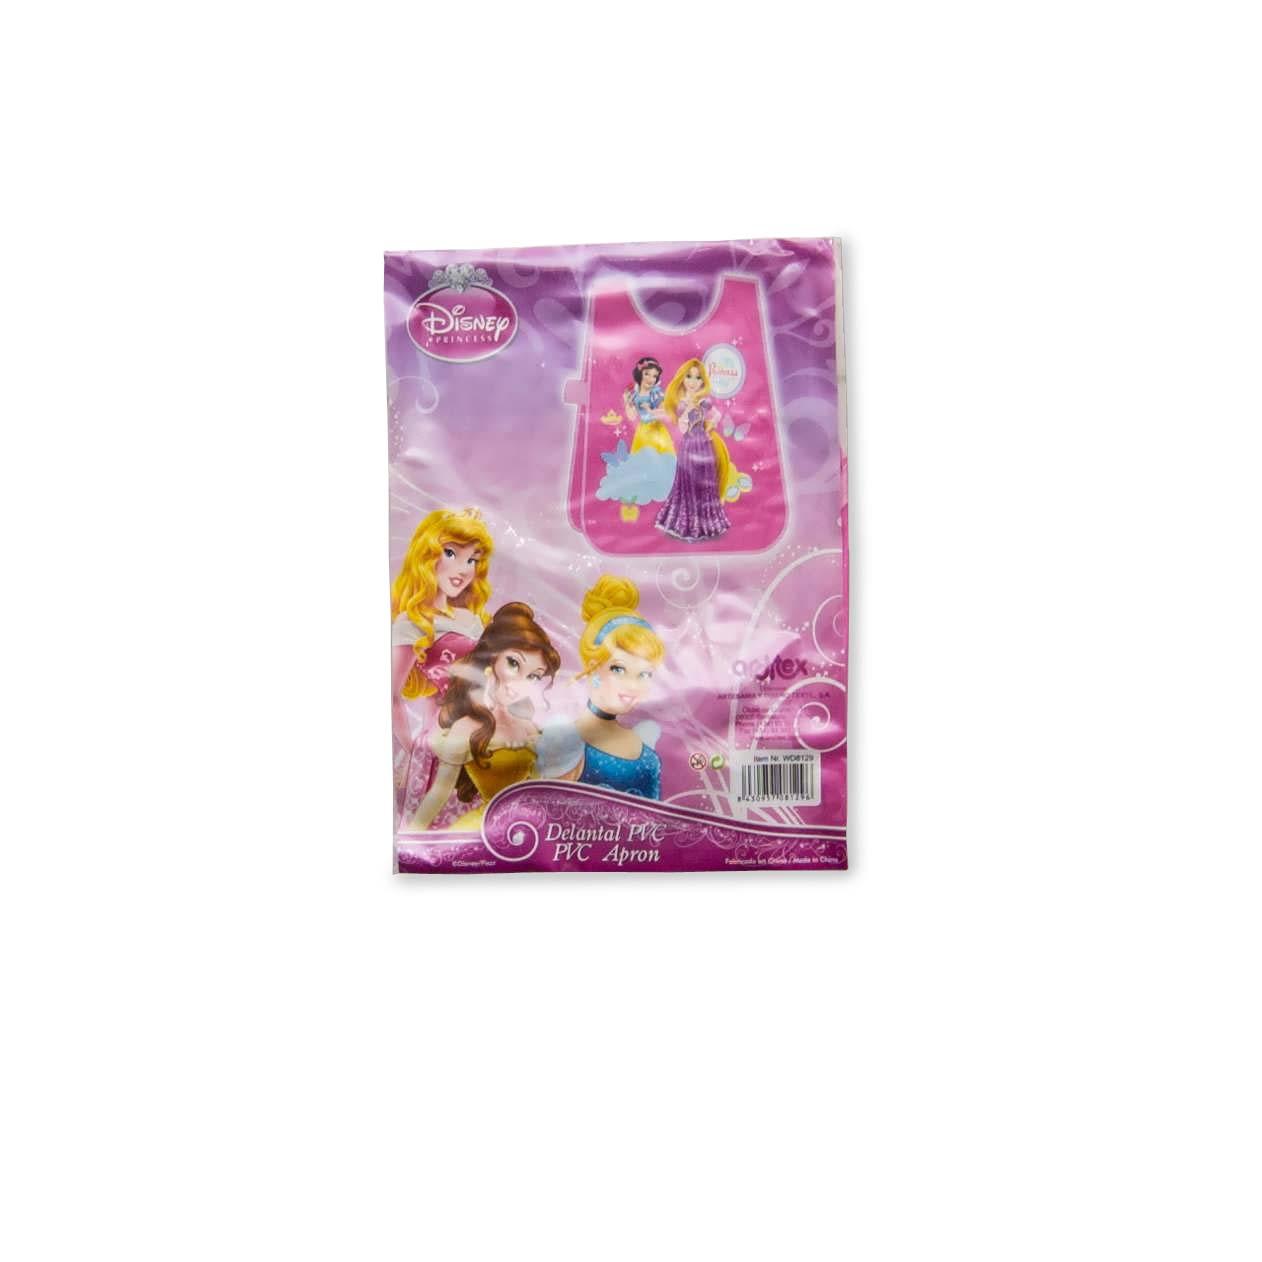 Baveta Disney Princess